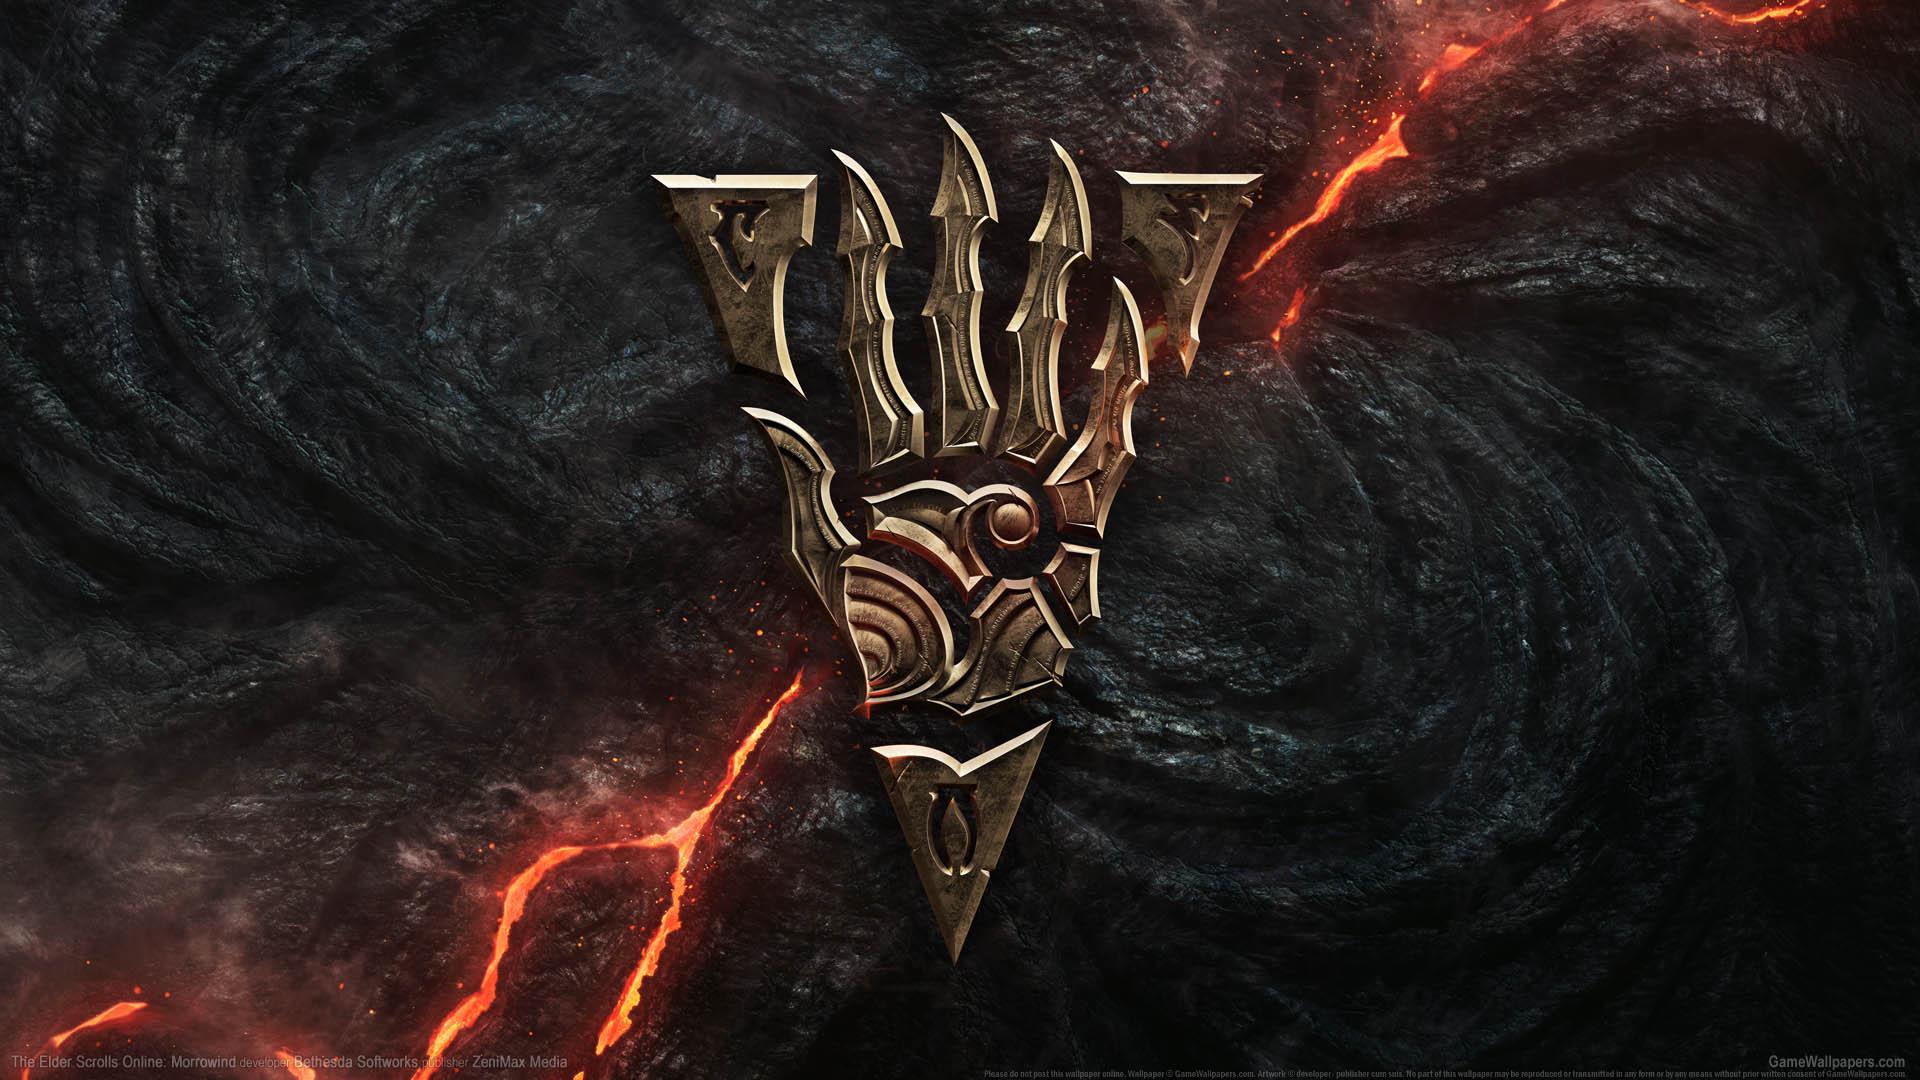 The Elder Scrolls Online Elder Scrolls Online Morrowind